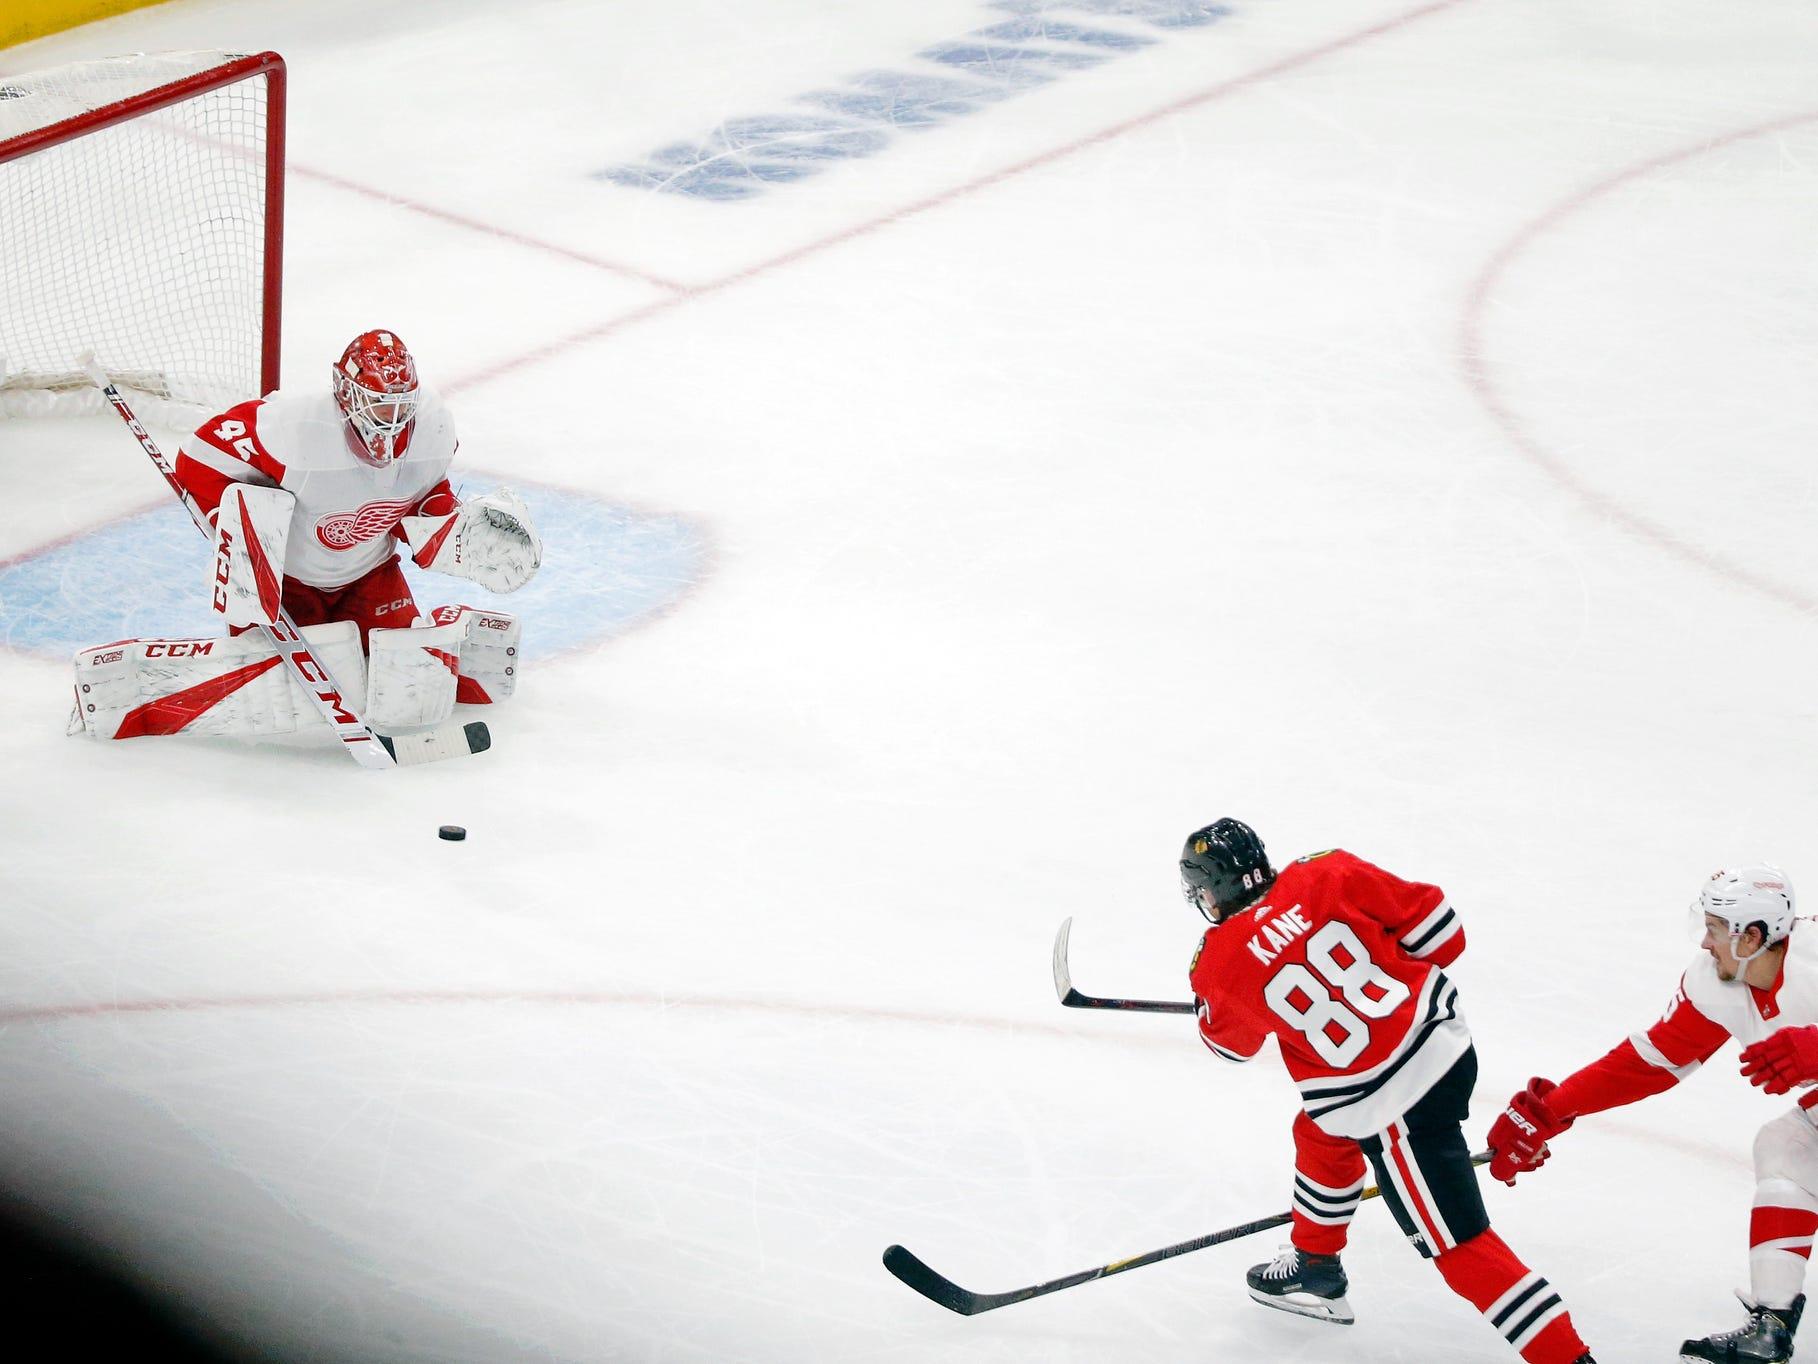 Chicago Blackhawks right wing Patrick Kane scores past Detroit Red Wings goaltender Jonathan Bernier, as defenseman Danny DeKeyser defends during the third period at United Center, Sunday, Feb. 10, 2019.